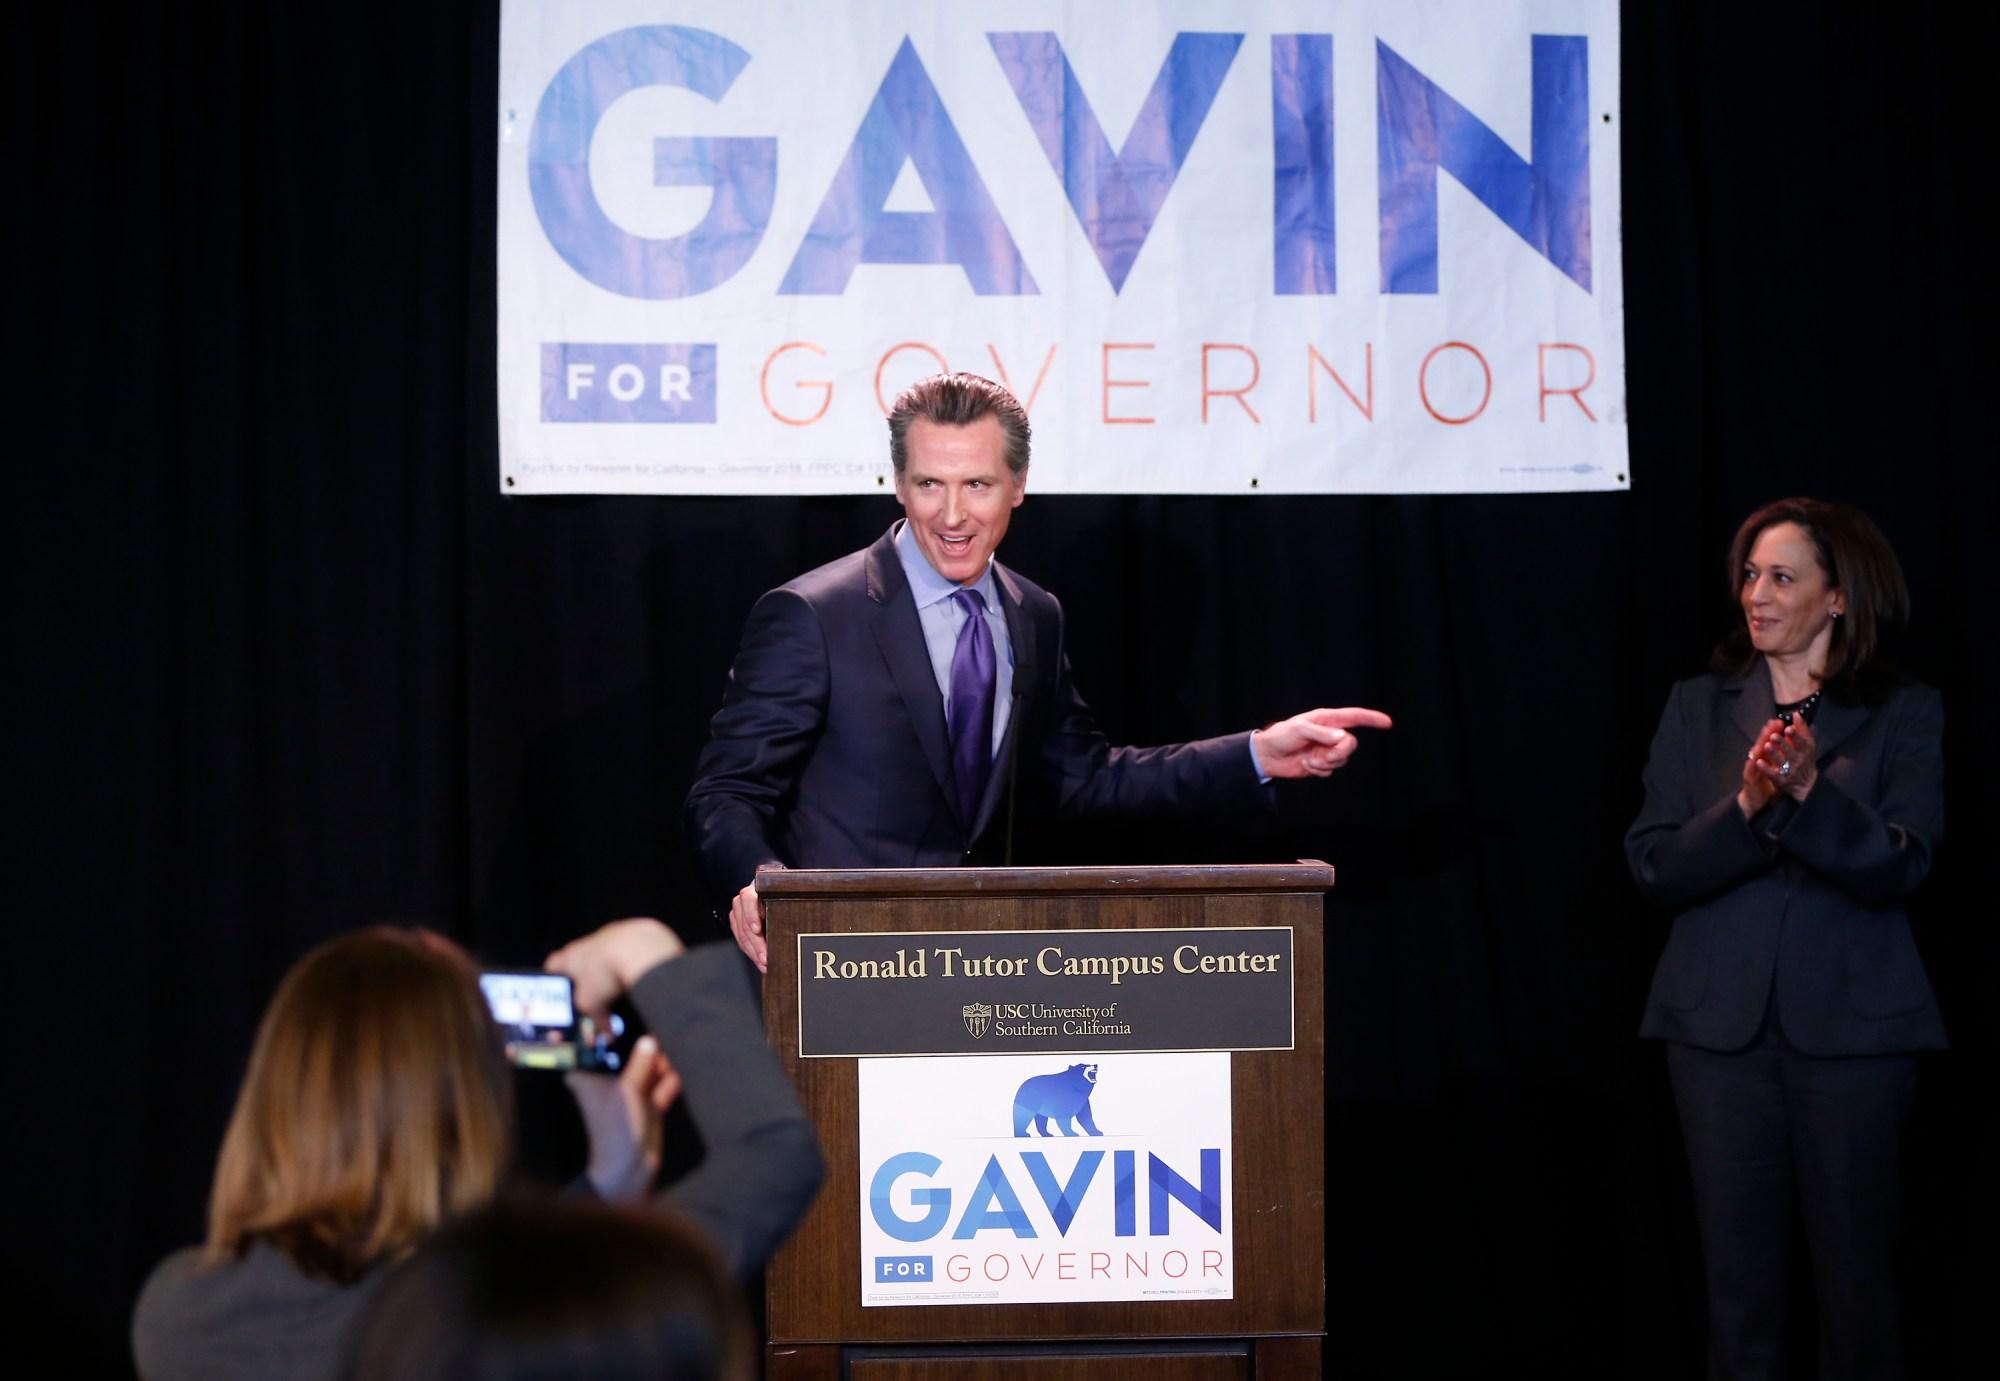 Sen. Kamala Harris, right, endorses California Lt. Gov. GavinNewsom, left, for the 2018 California Governor's race at the Ronald Tutor Campus Center at the University of Southern California on Feb. 16, 2018. (Damian Dovarganes/Associated Press)